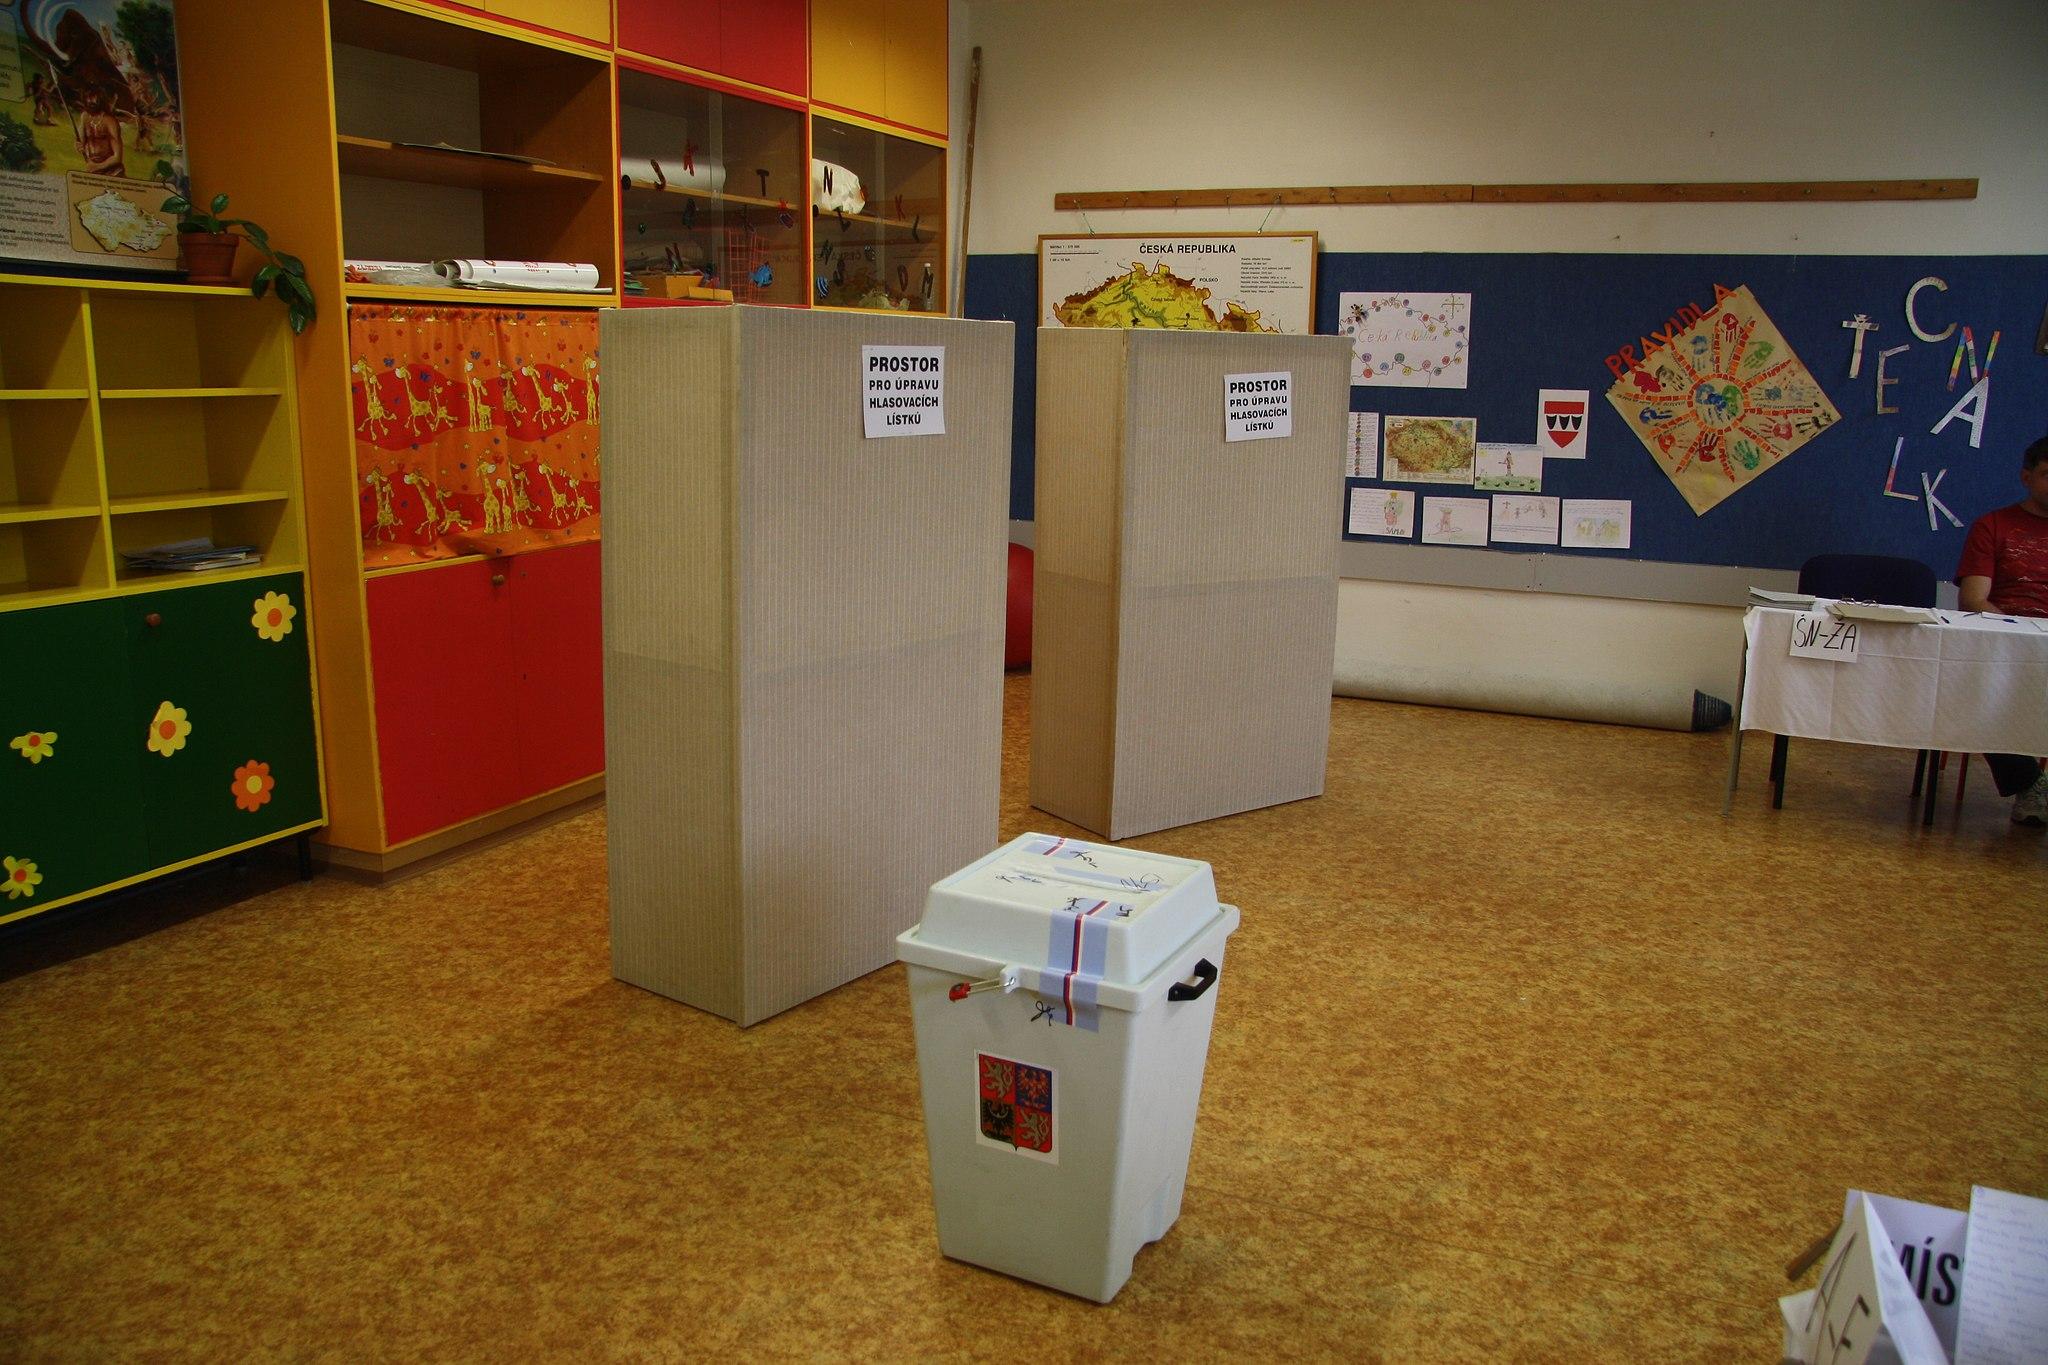 Polling_room_for_municipal_votes_in_Benešova_elementary_school_in_Třebíč.JPG